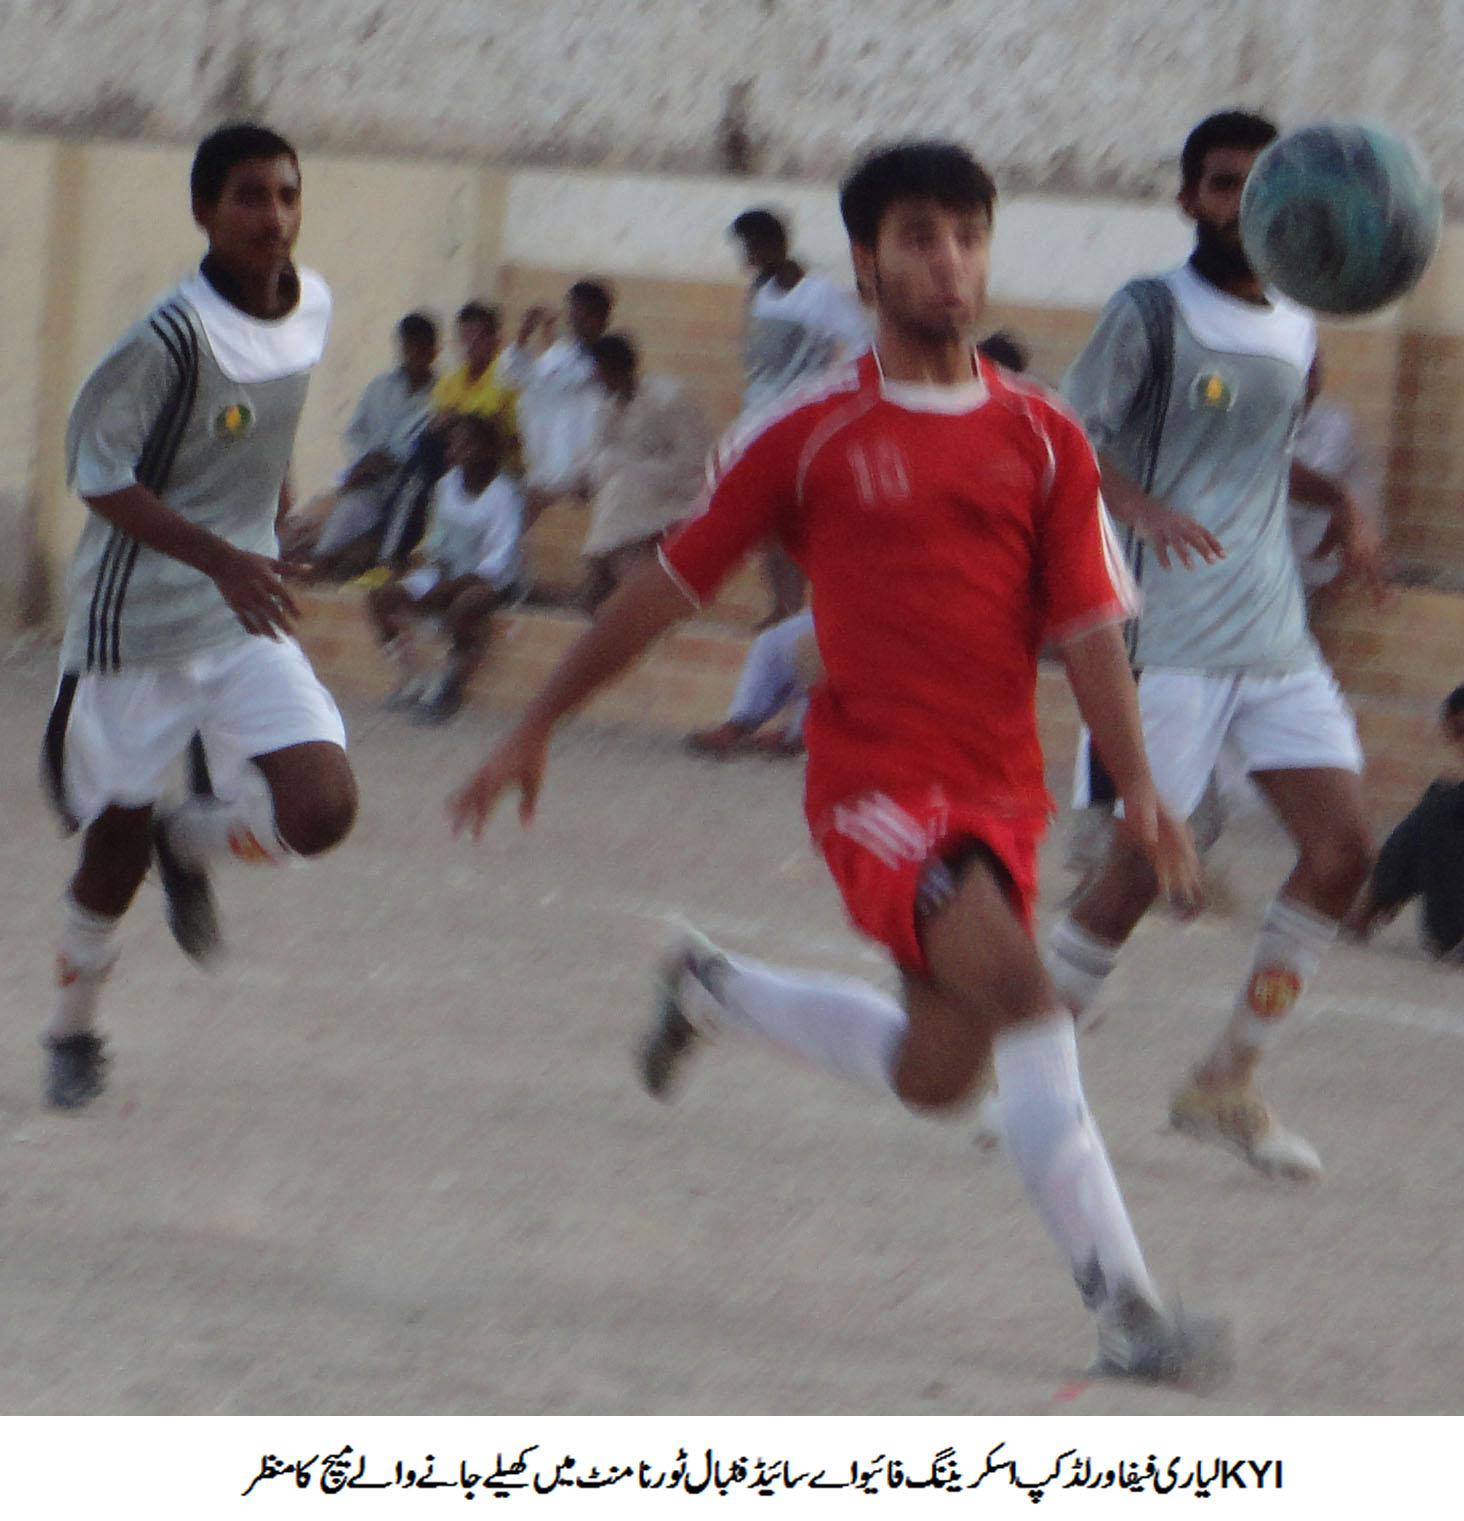 KYI Lyari FIFA World Cup 5v5 Tournament: Sindh Baloch, KU Centre Lyari and Lyari Mohammedan grab wins